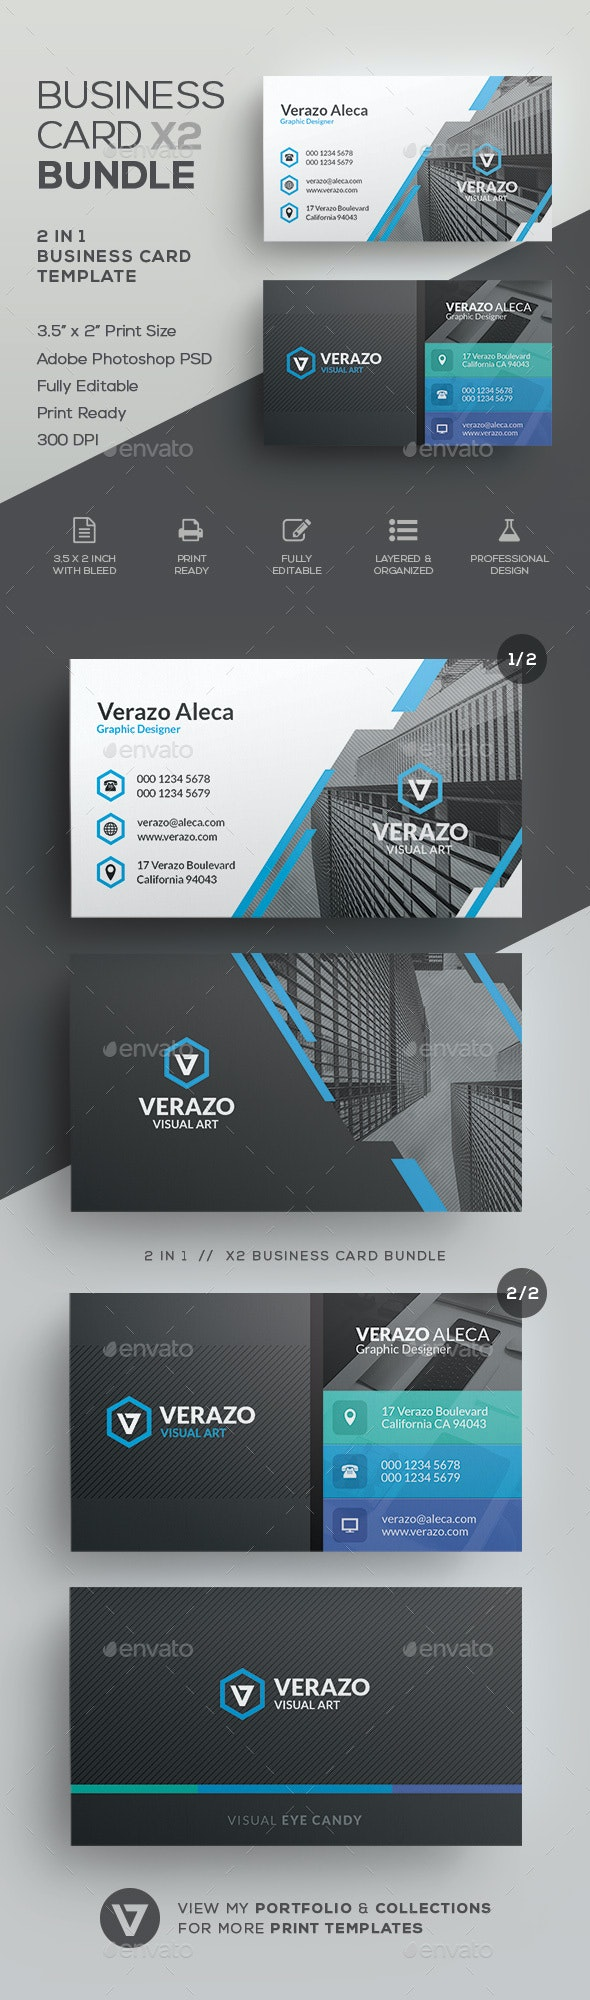 Business Card Bundle 55 - Corporate Business Cards